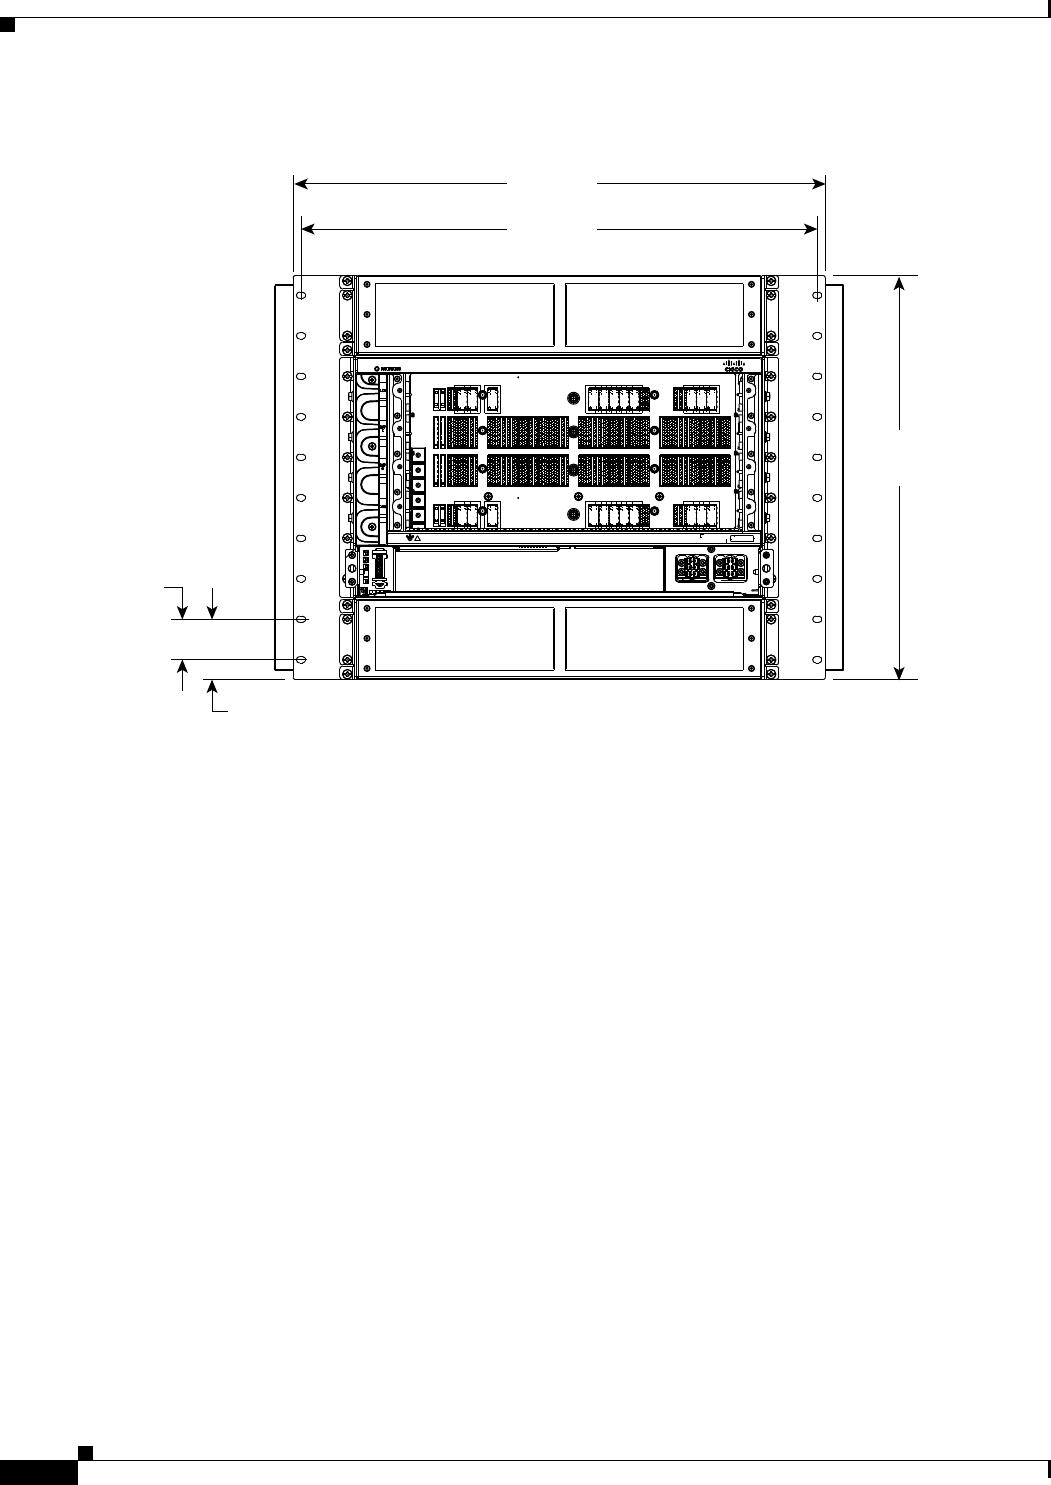 Graco 9000 Cisco ASR Series Aggregation Services Router